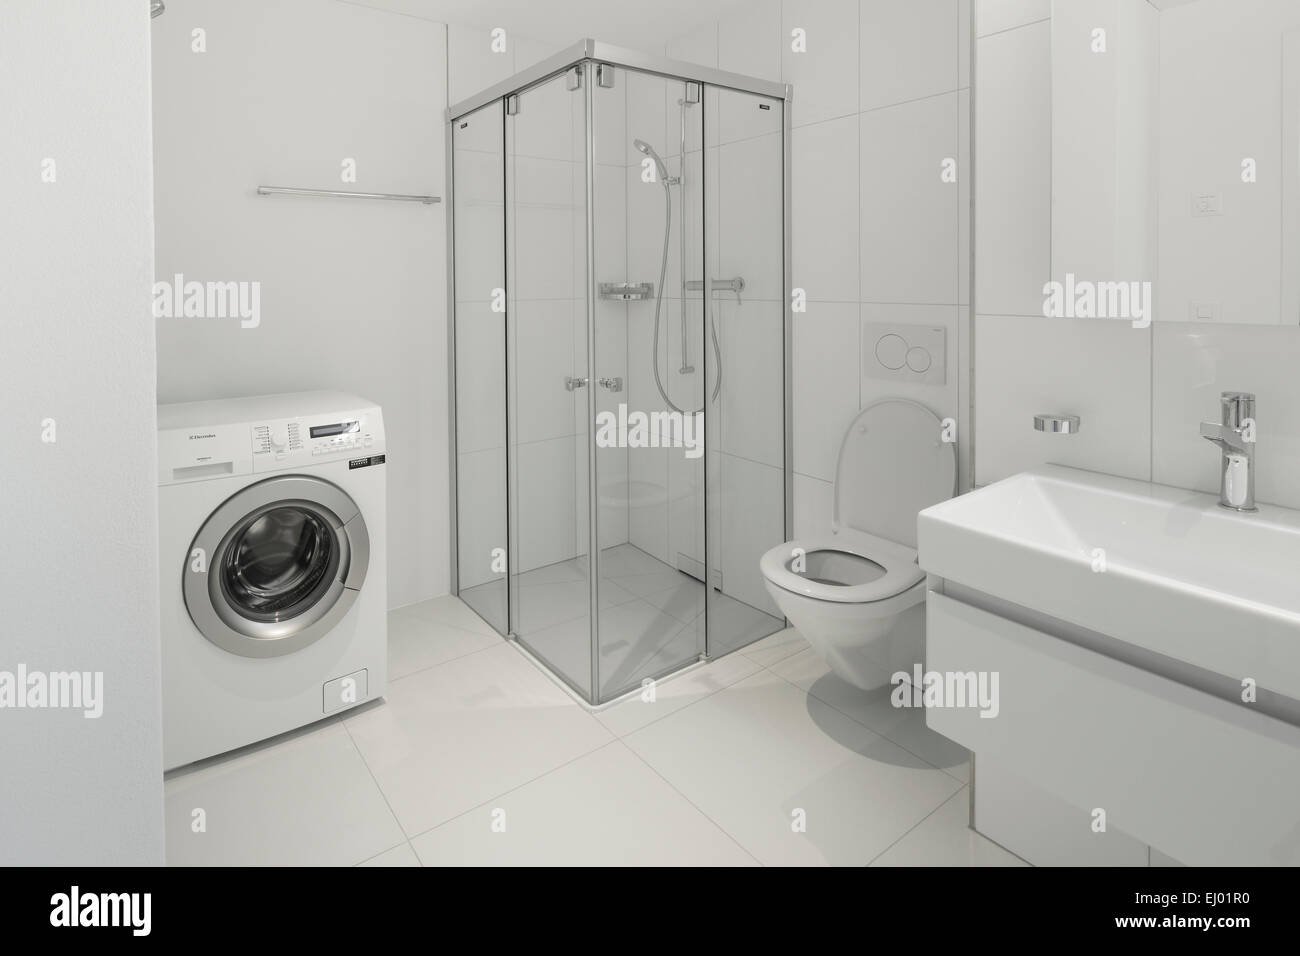 Architecture, bathtub, bathroom, house, home, interior, Switzerland, WC, apartment, bath, toilet, white, - Stock Image